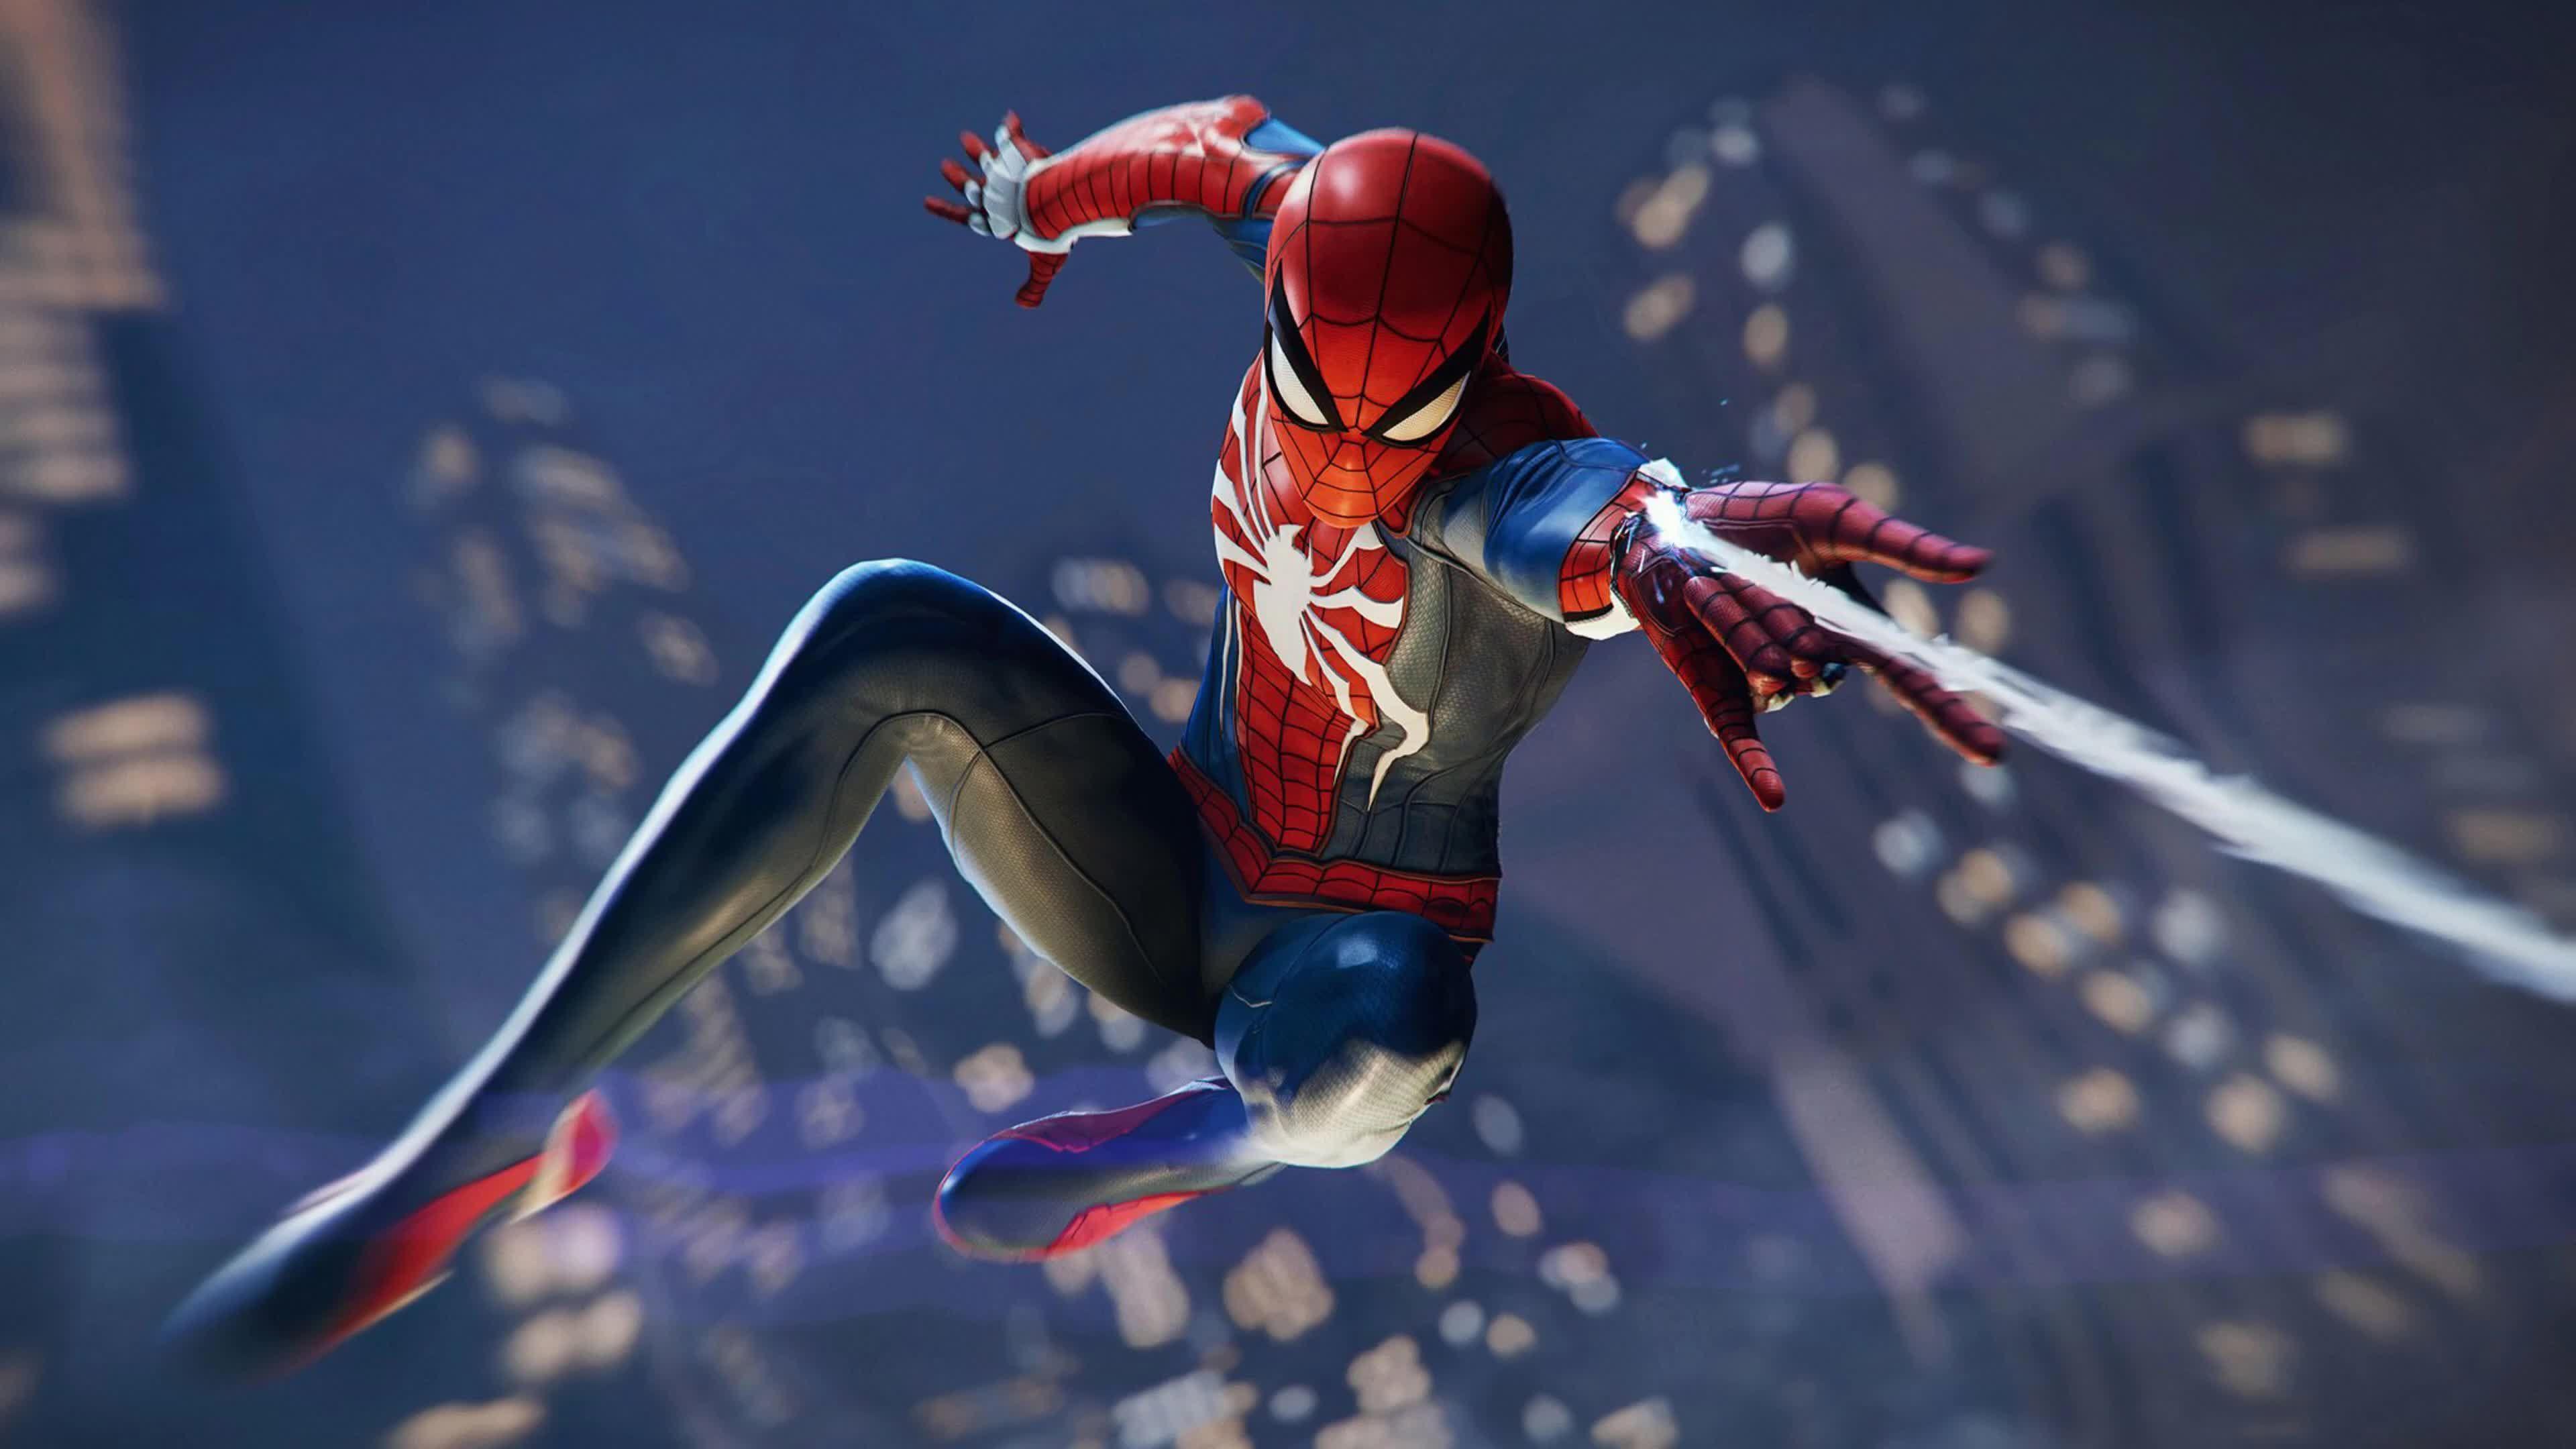 Spider-Man Superhero Wallpapers - Wallpaper Cave